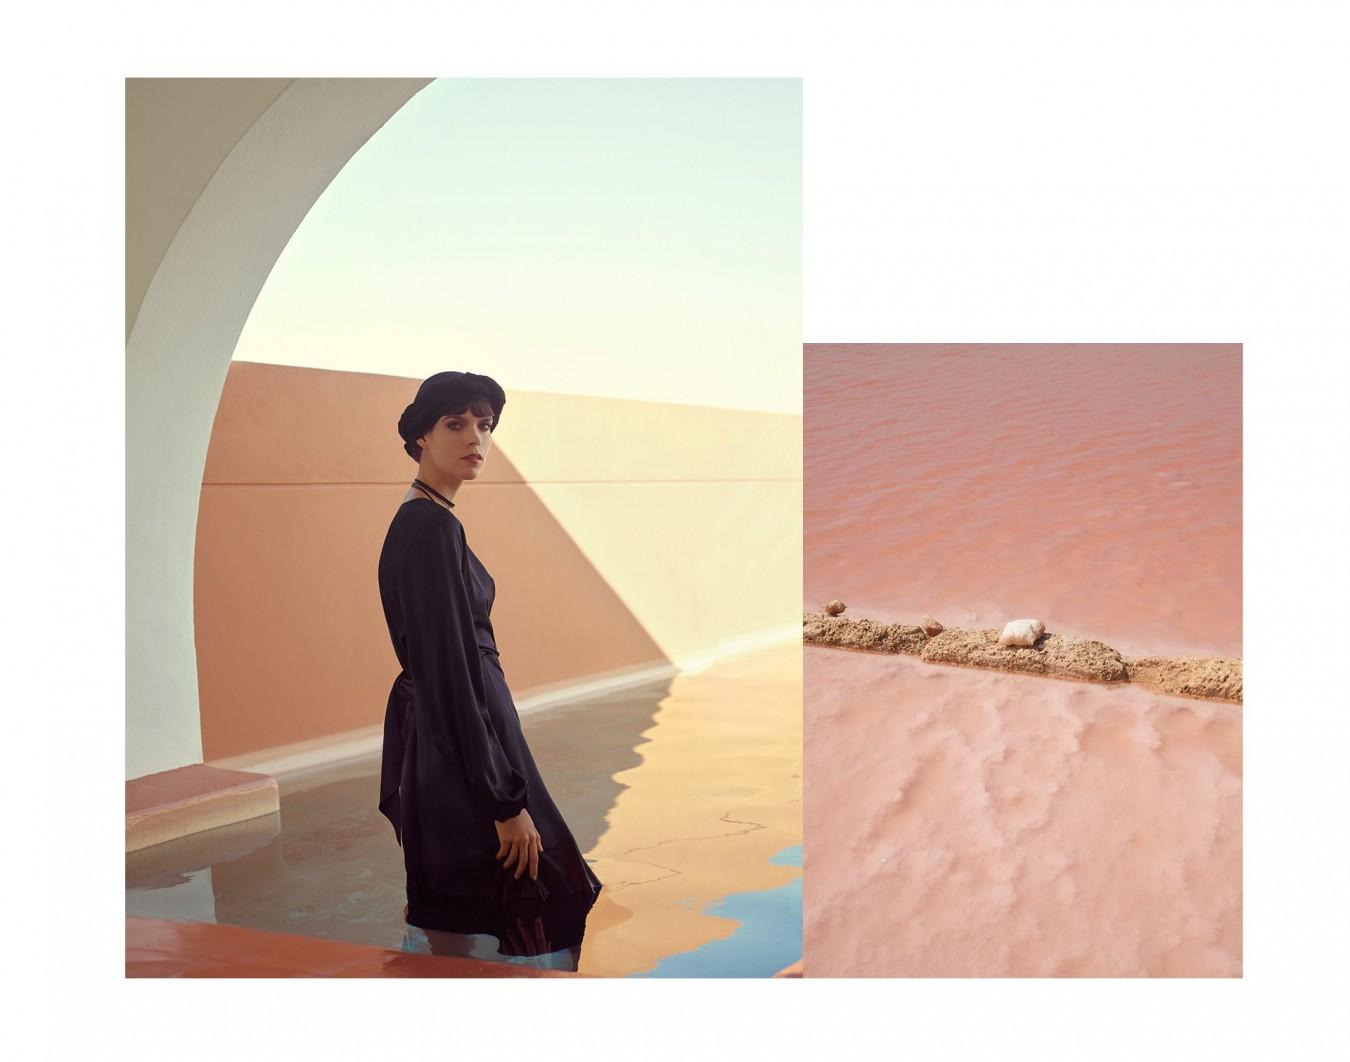 RESERVED Fashion_Photographers: Magda Wunsche & Aga Samsel / SameSame_Styling: Andrzej Sobolewski_MUA: Wilson_Hair: Michał Bielecki_Production: New Order Warsaw